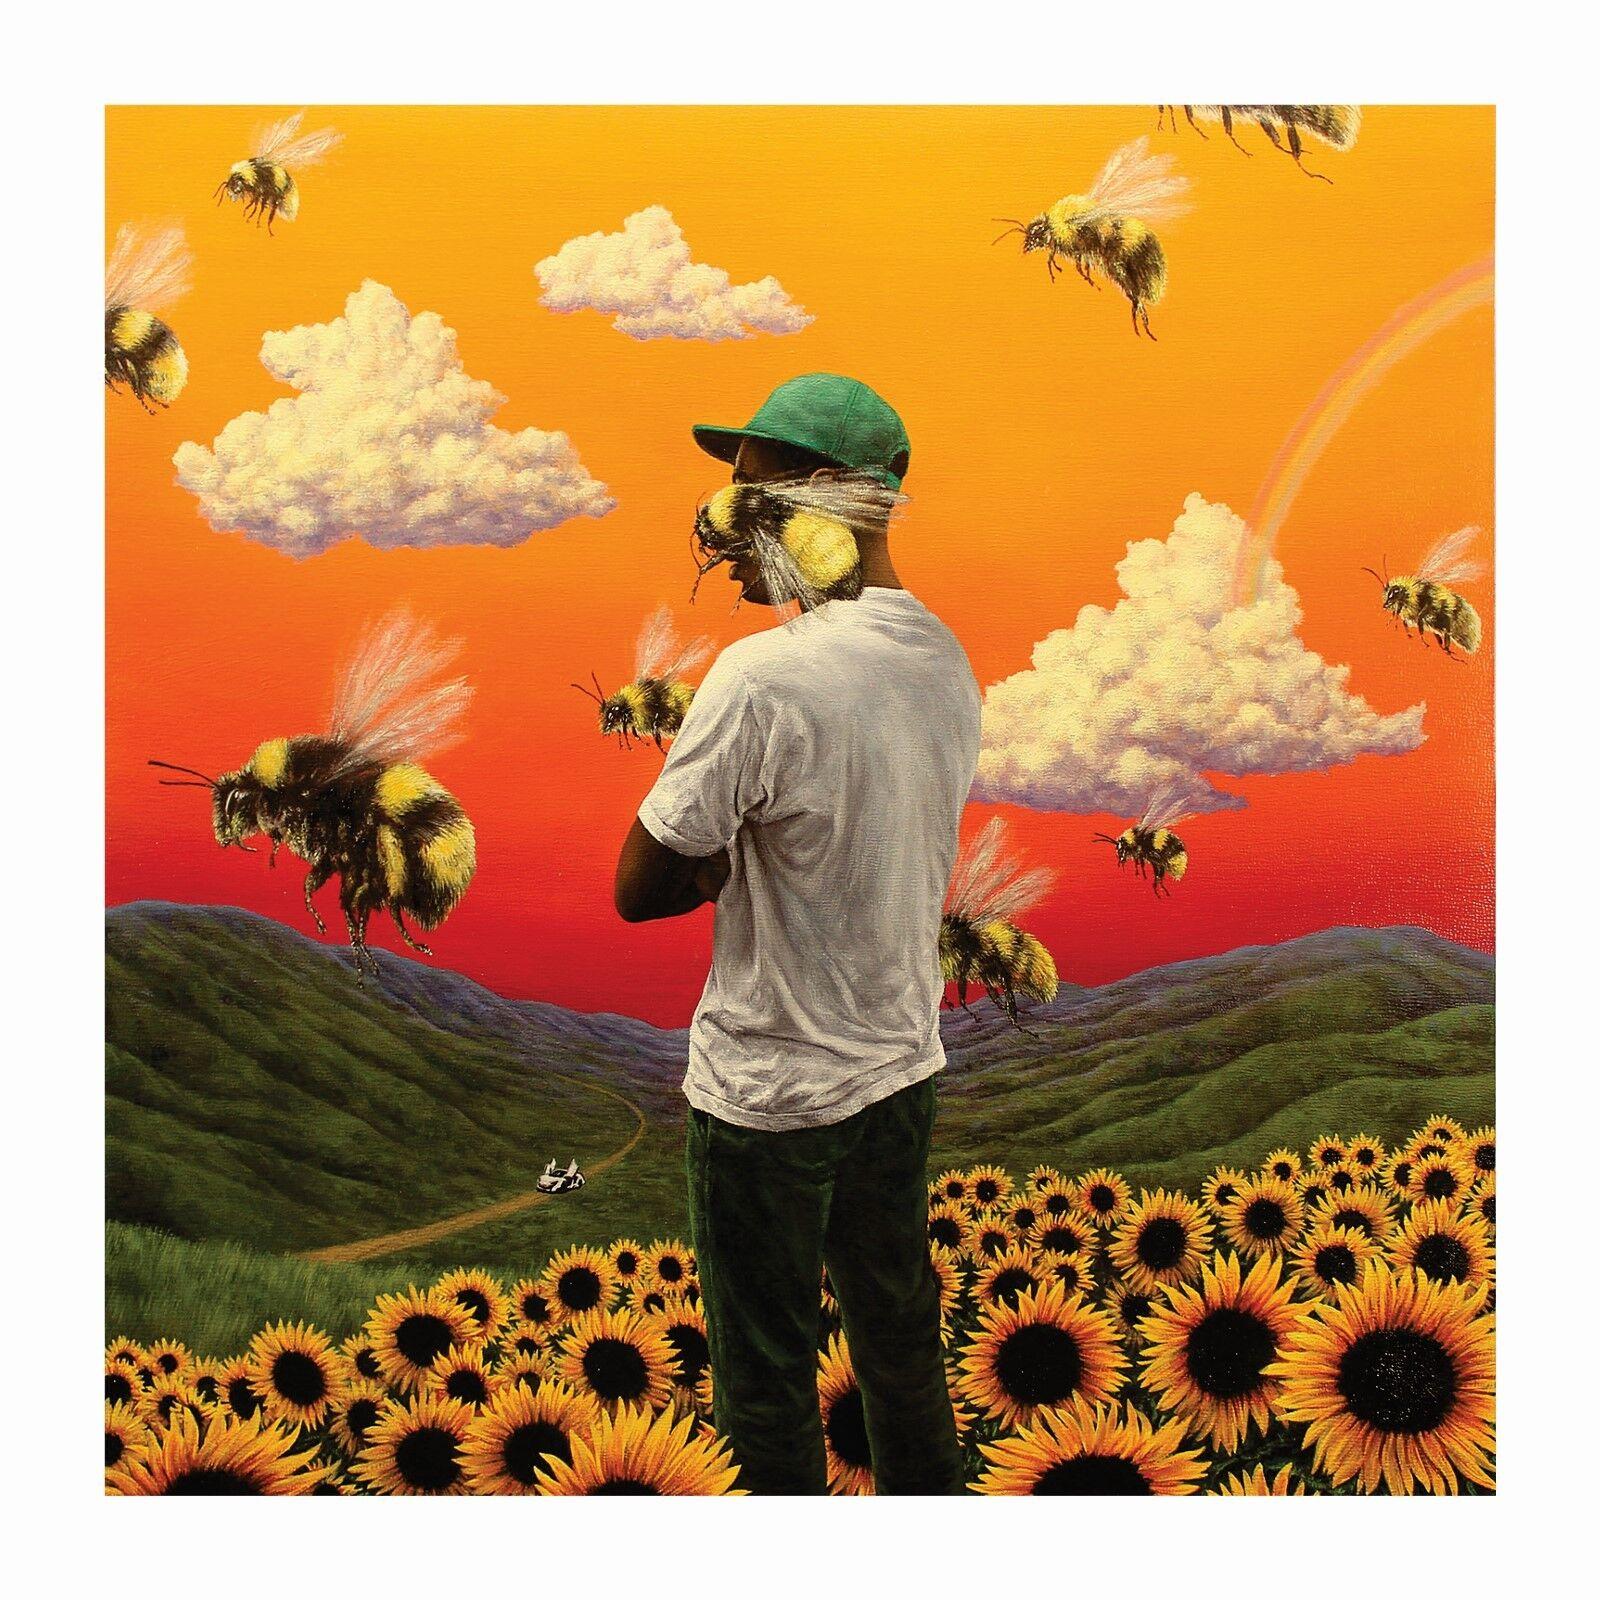 Tyler Poster Print 20 24x24 the Creator Flower Boy Rap Music Album Cover C-491